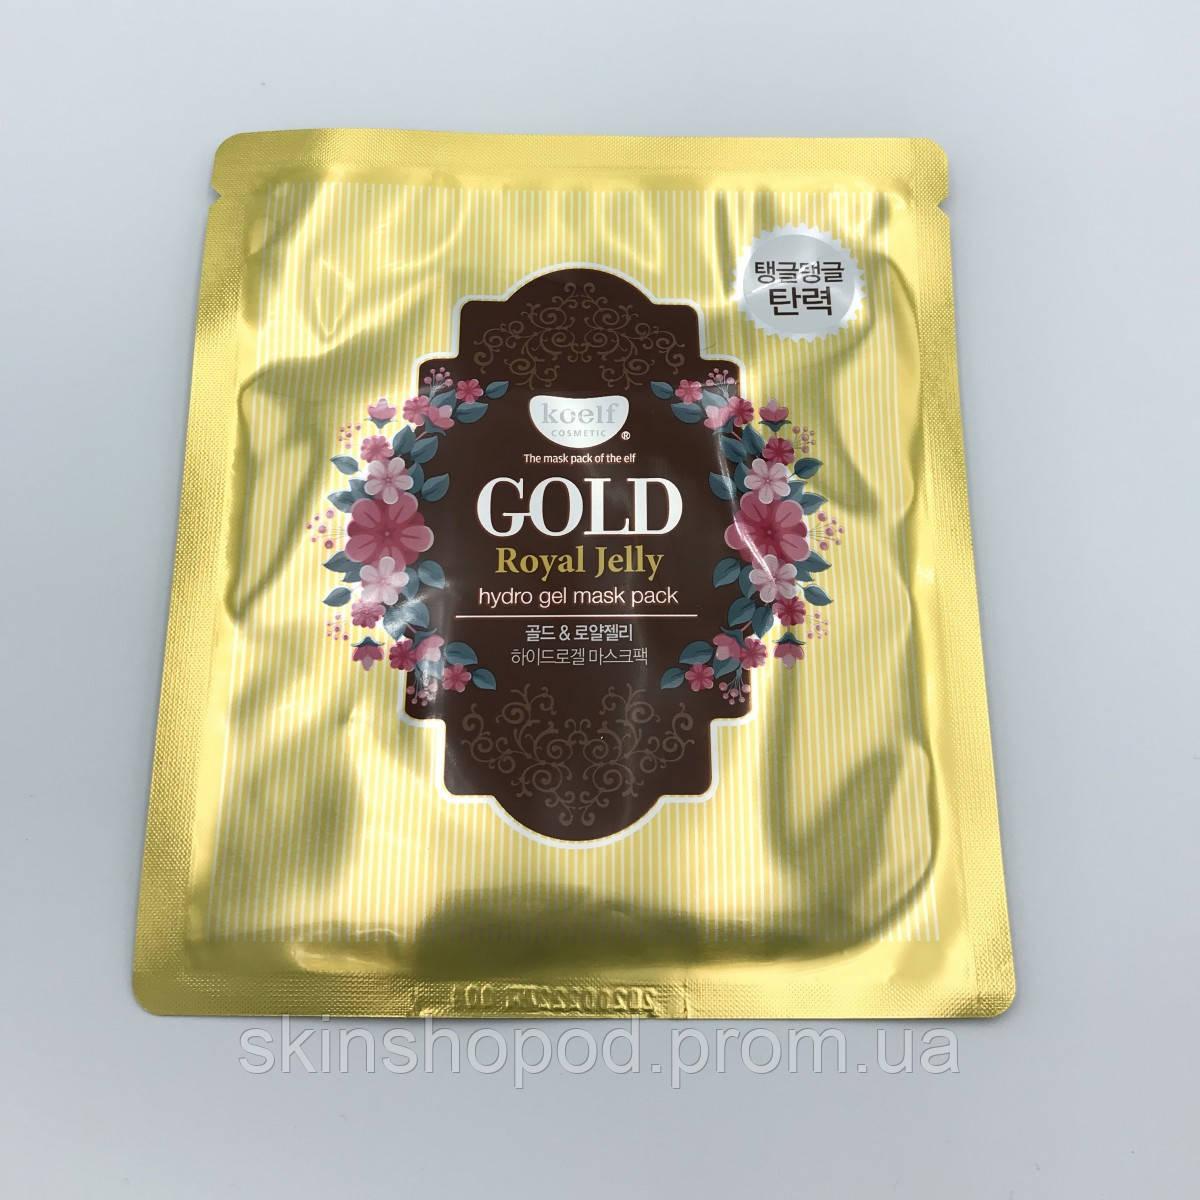 Гидрогелевая маска с маточным молочком и золотом Koelf Hydrogel Mask Pack Gold & Royal Jelly - 30 г